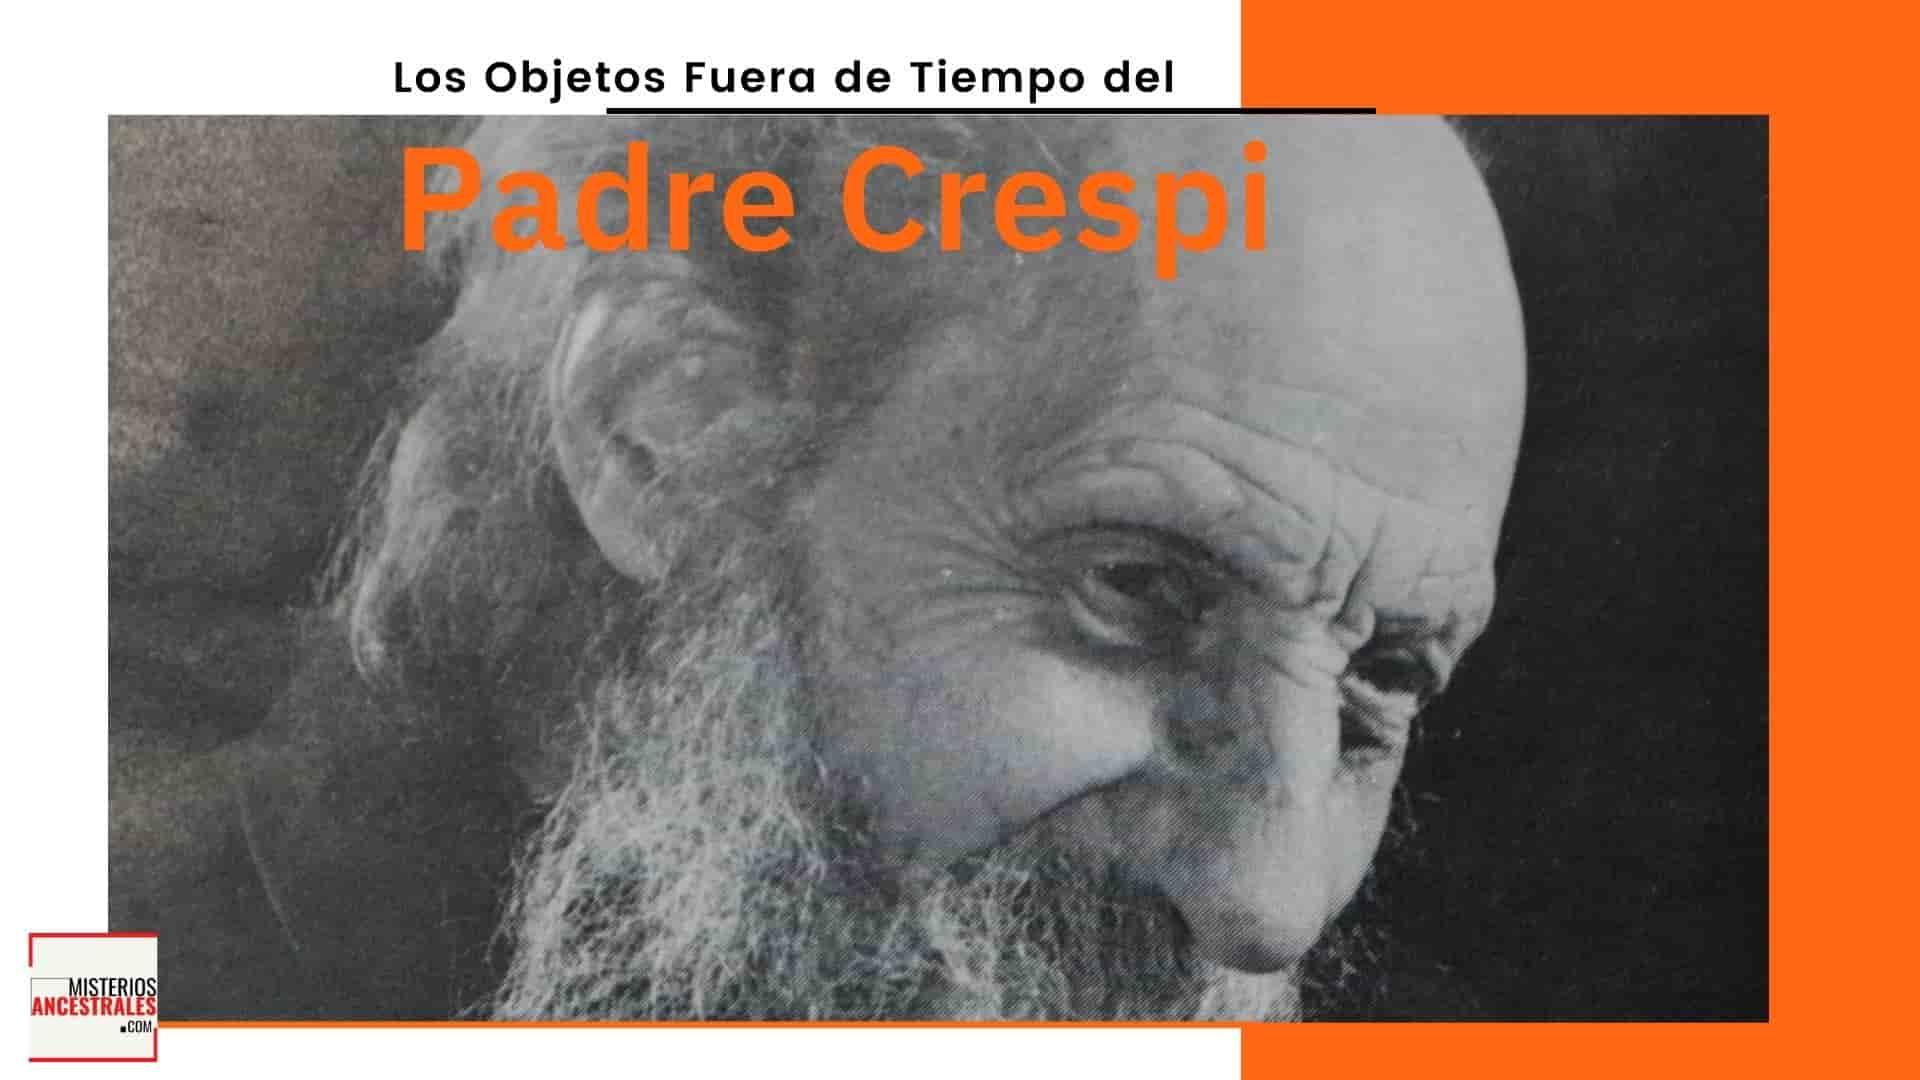 Padre Crespi